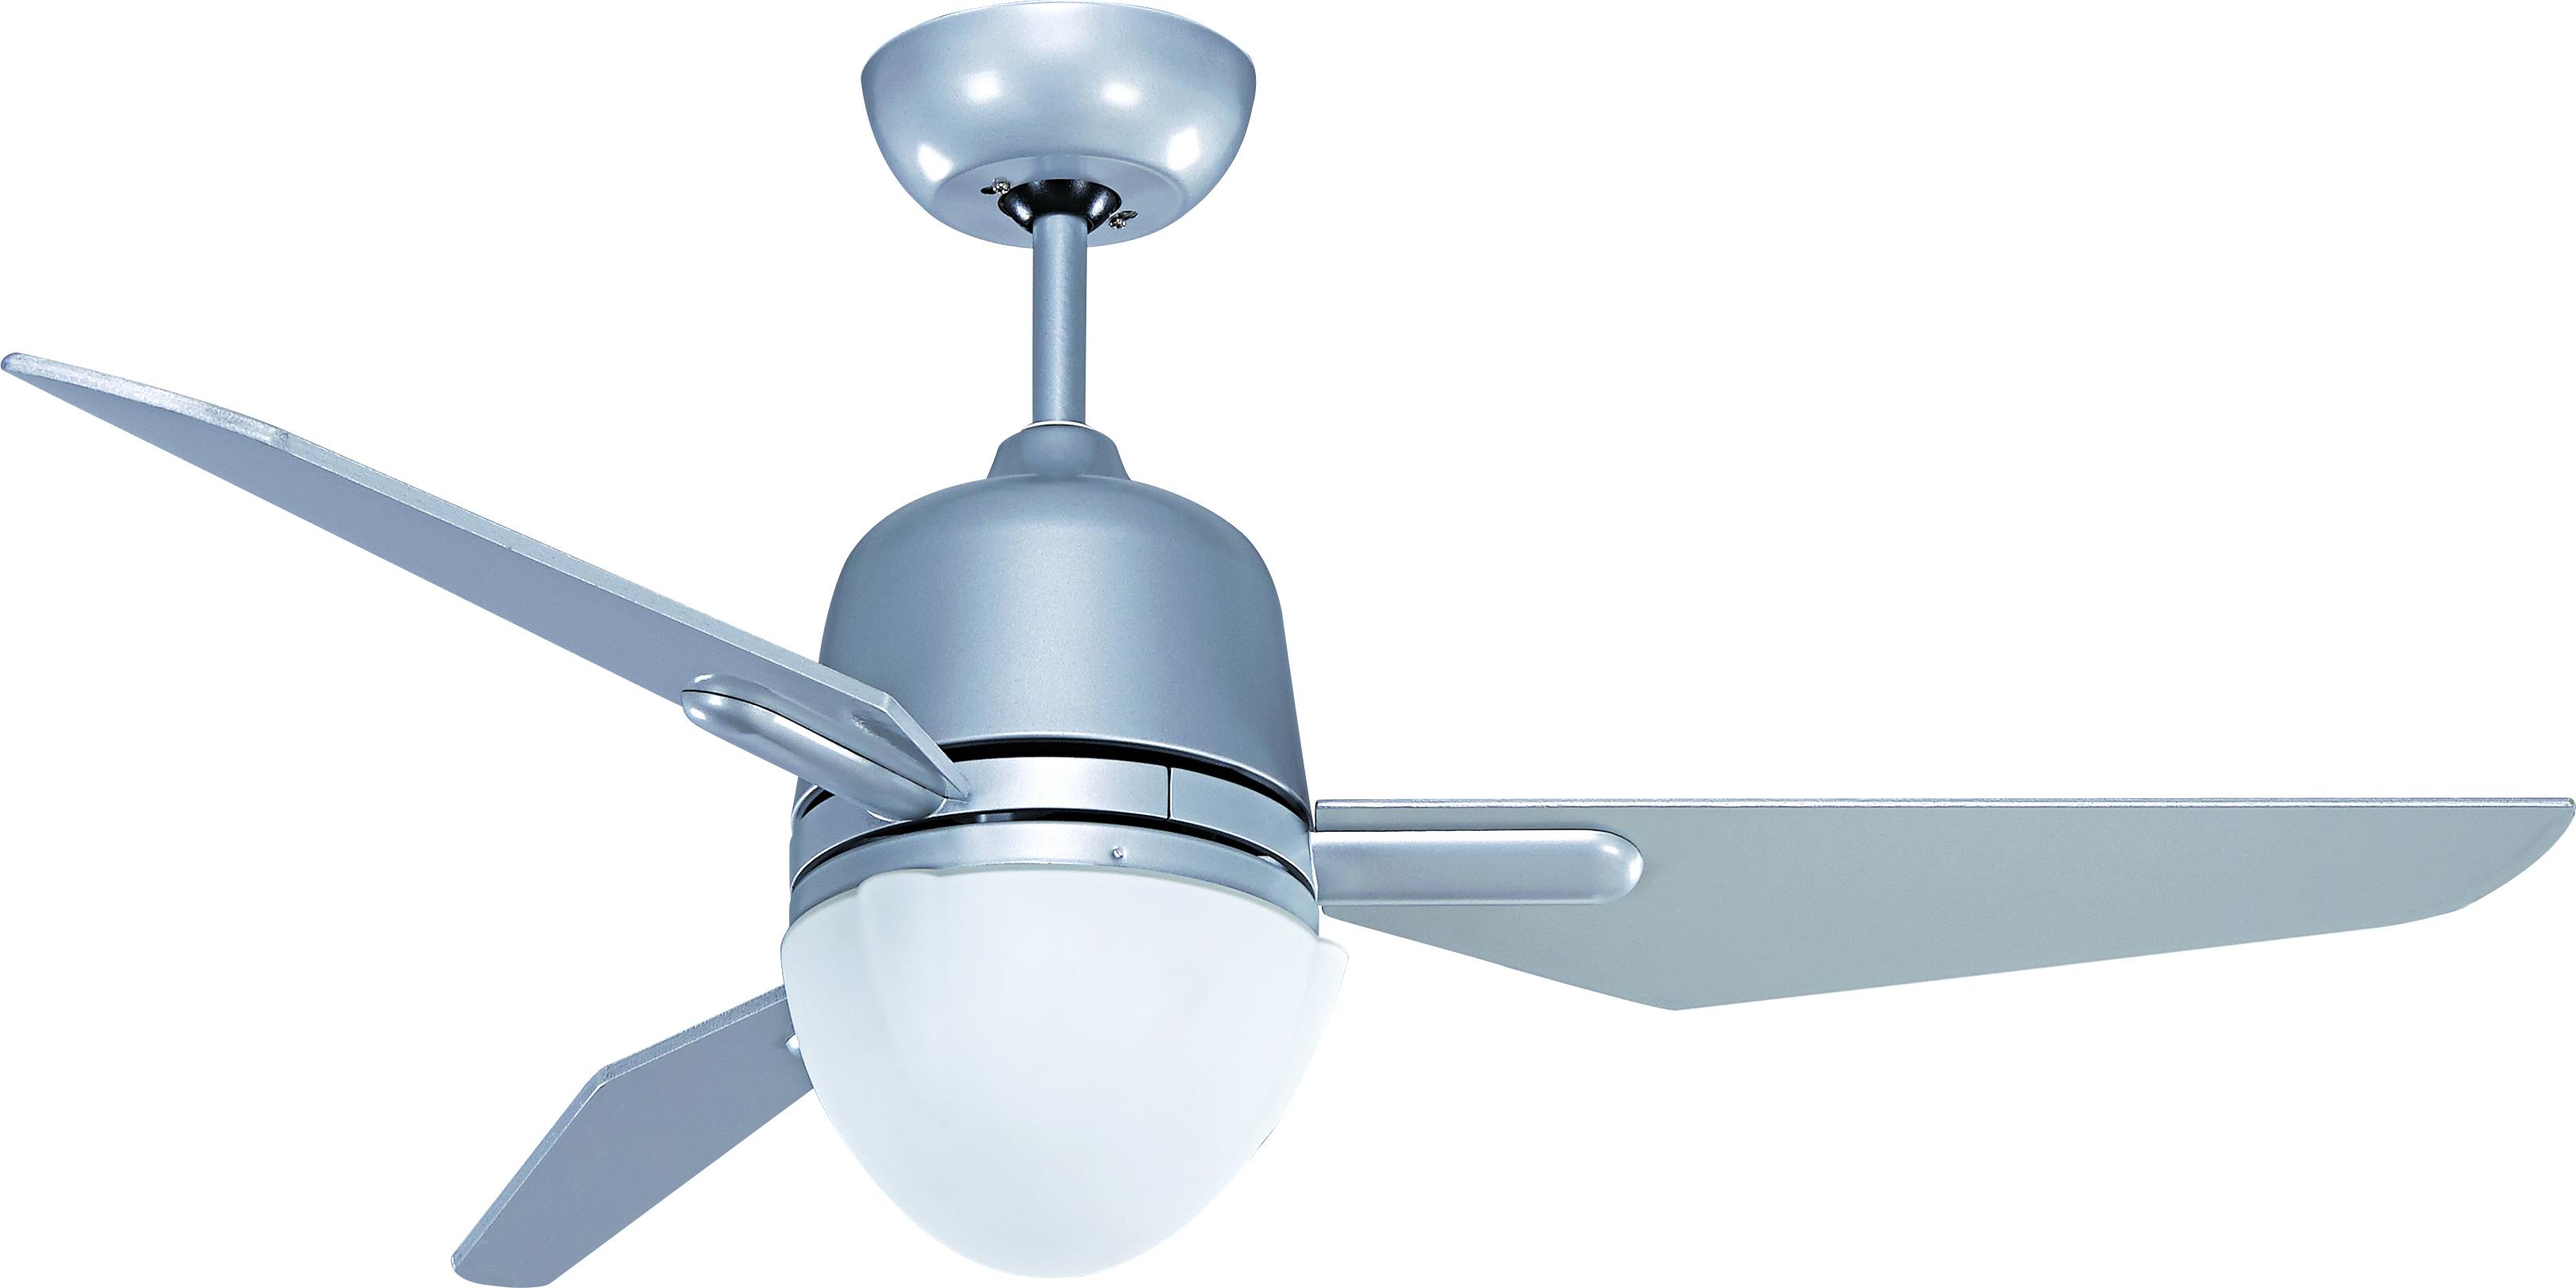 15289【Light Fan】Wind Power,  BLDC Brushless DC/Silver